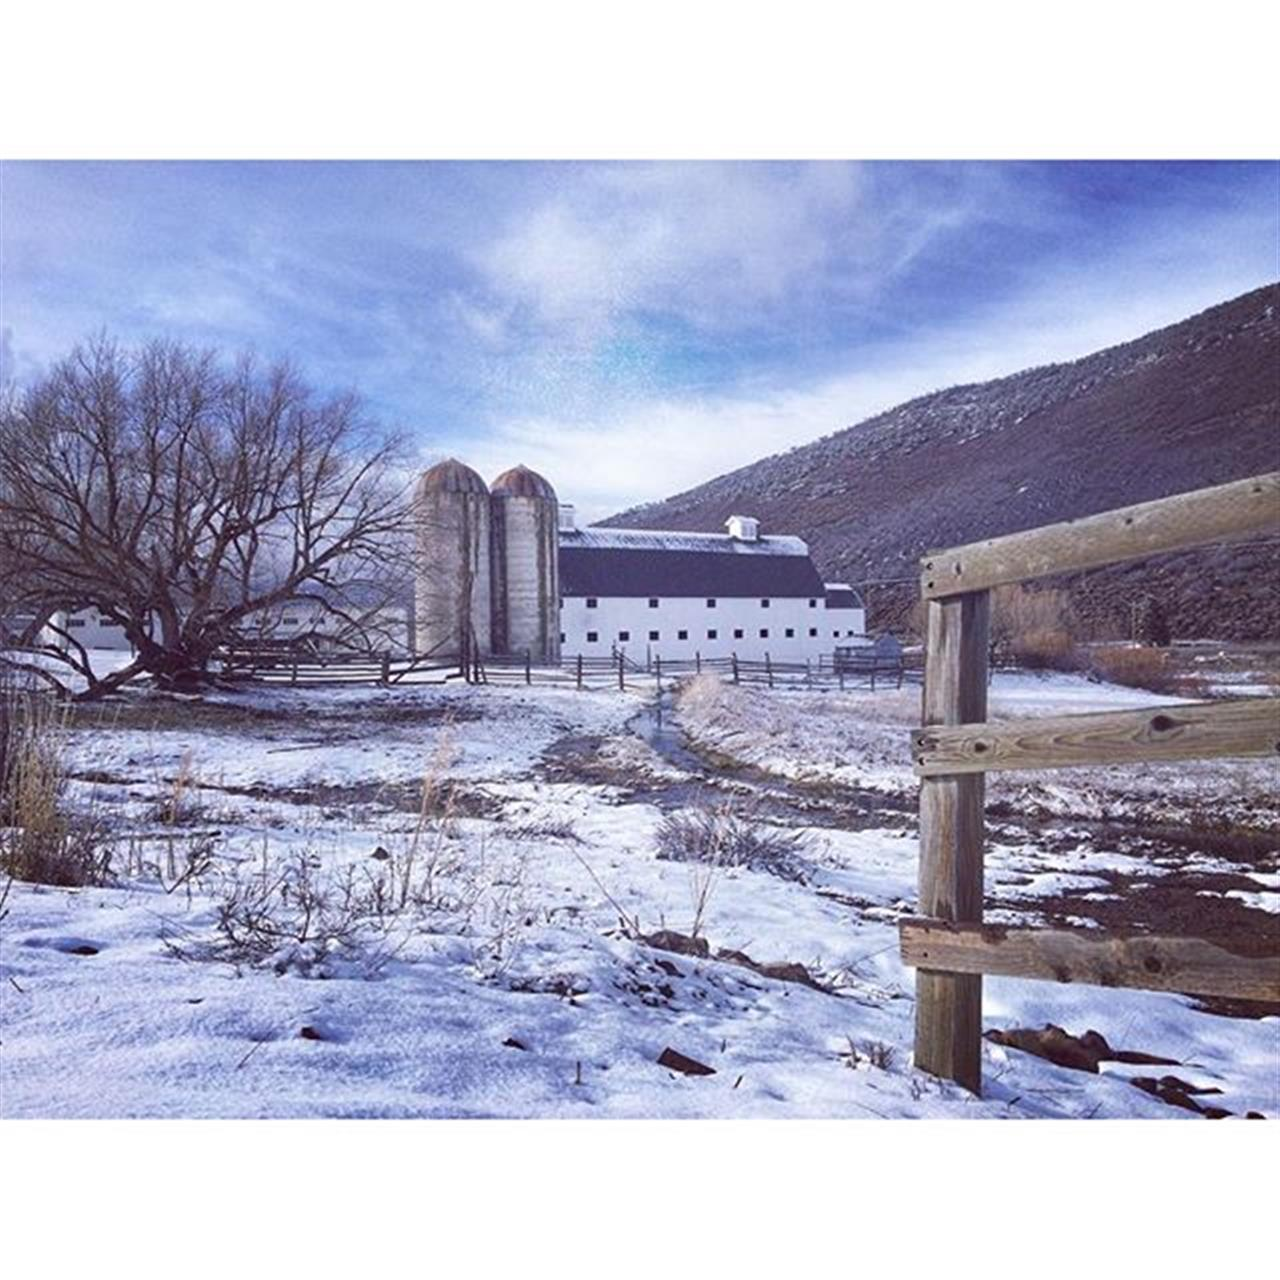 Spring in Park City! The iconic McPolin Farm. #lifeinparkcity #leadingrelocal #utahisrad #visitparkcity #parkcity #farm #barn